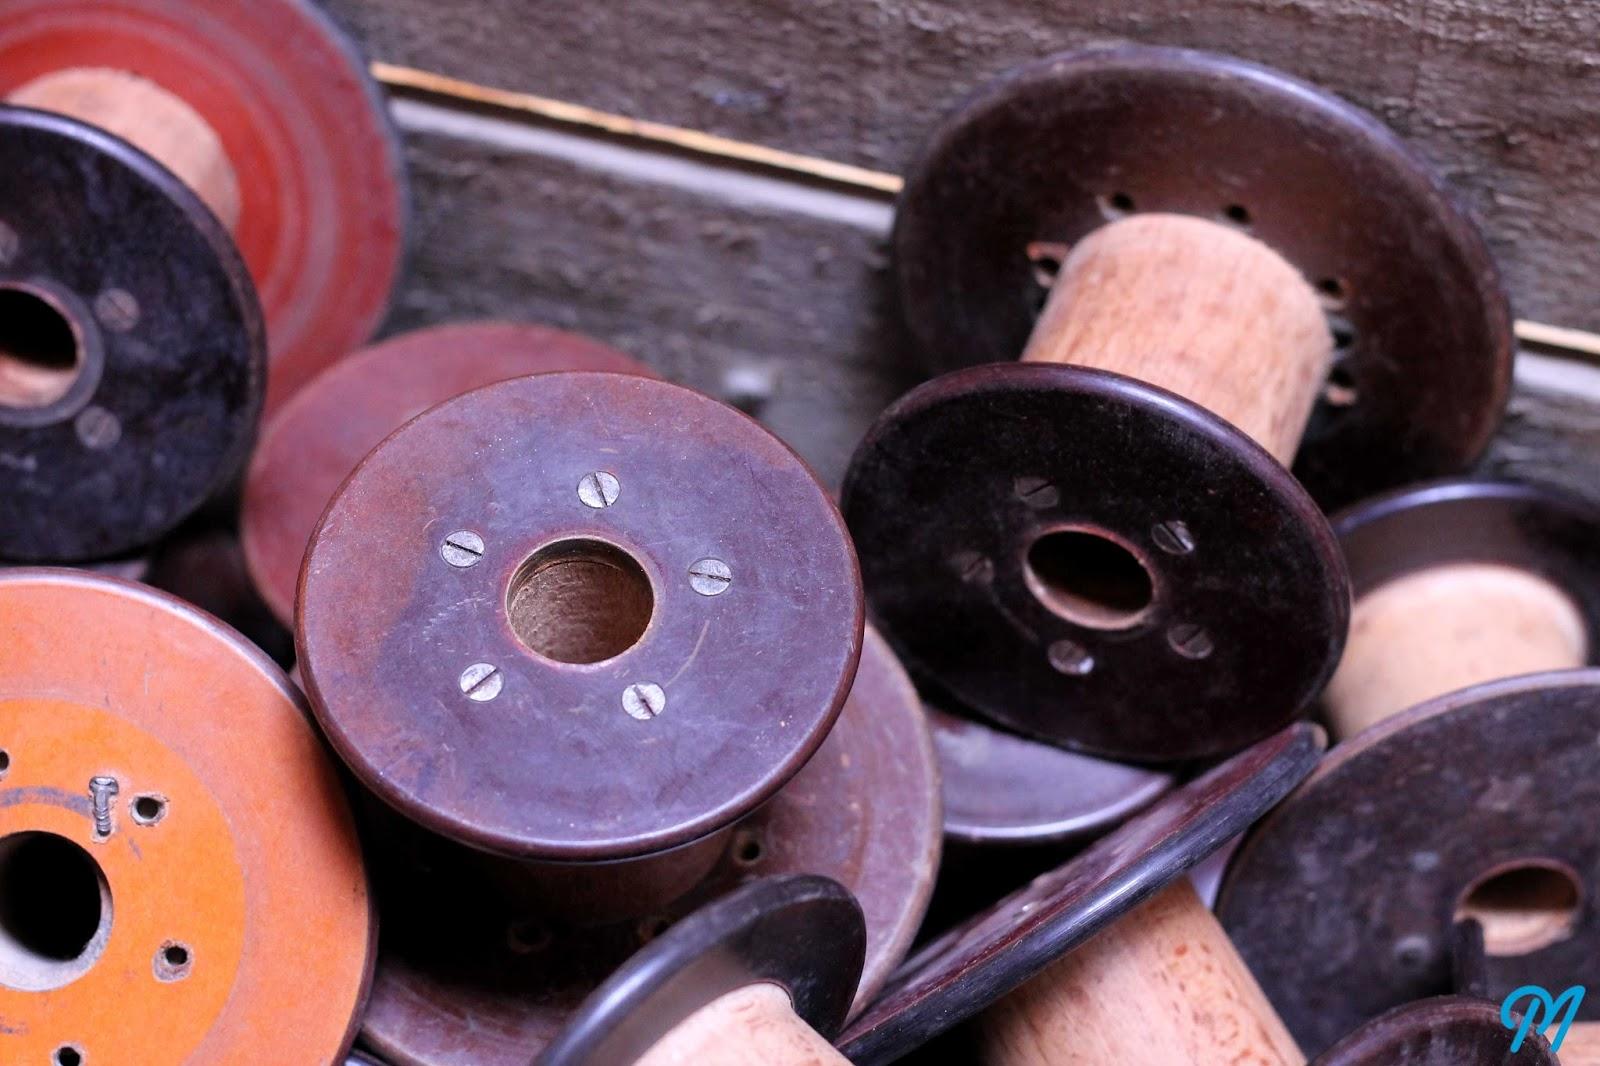 bobines anciennes de filature en bois bak lite et. Black Bedroom Furniture Sets. Home Design Ideas